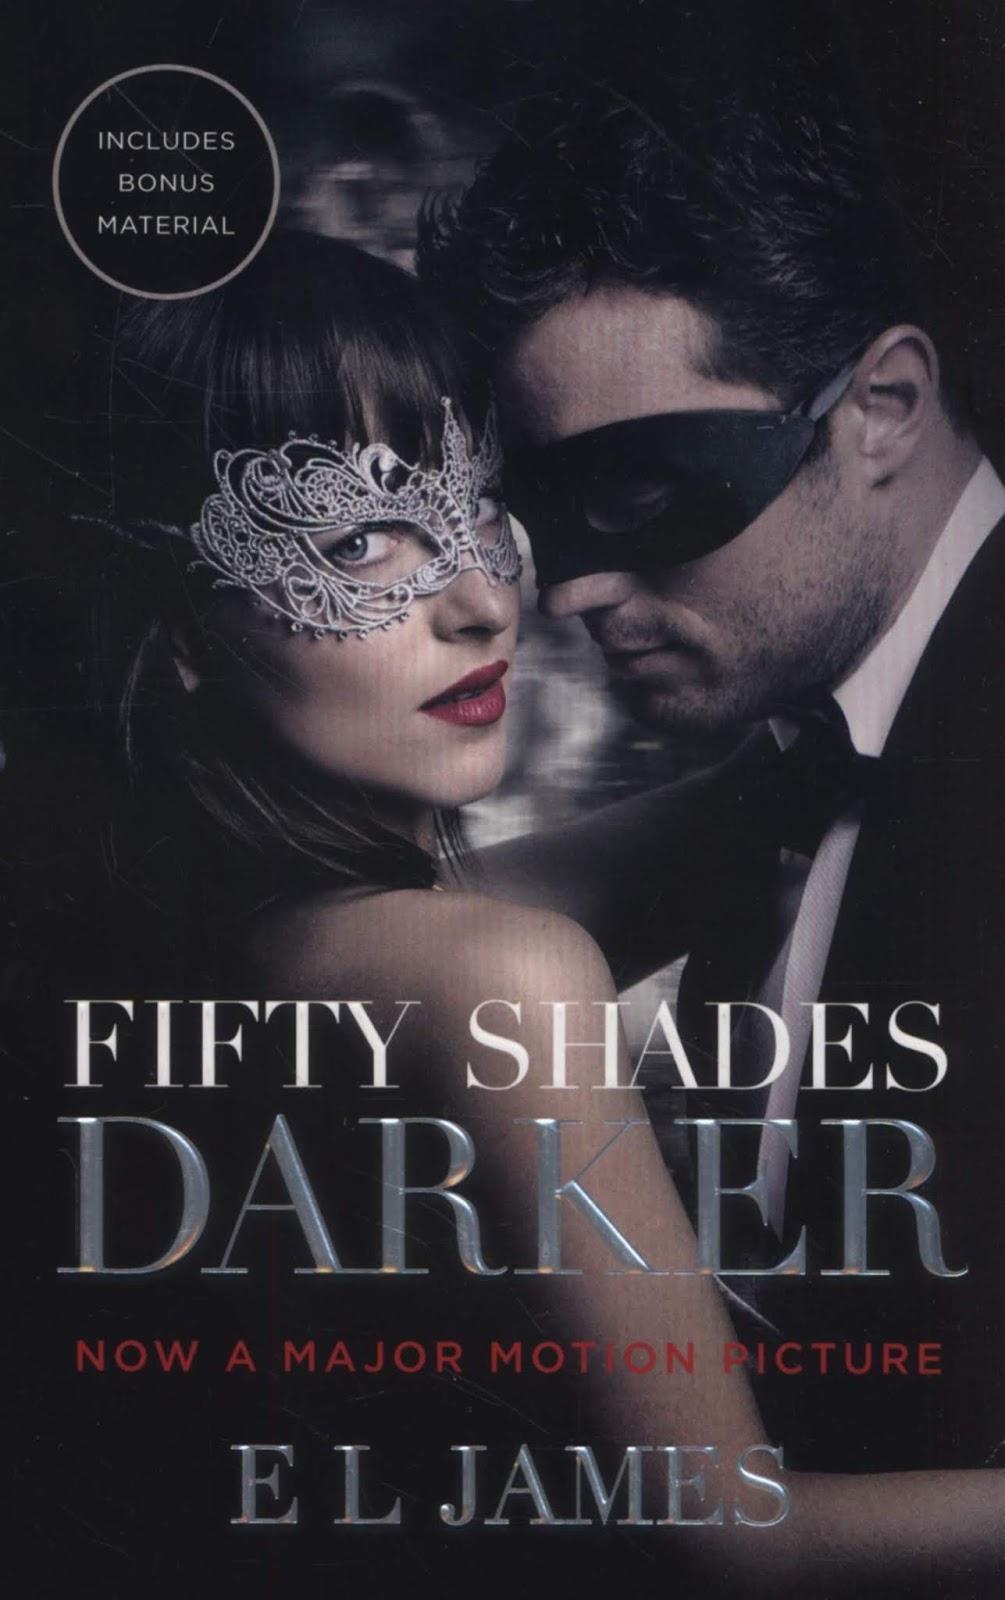 Download Film Fifty Shades Darker Sub Indo : download, fifty, shades, darker, Fifty, Shades, Collection